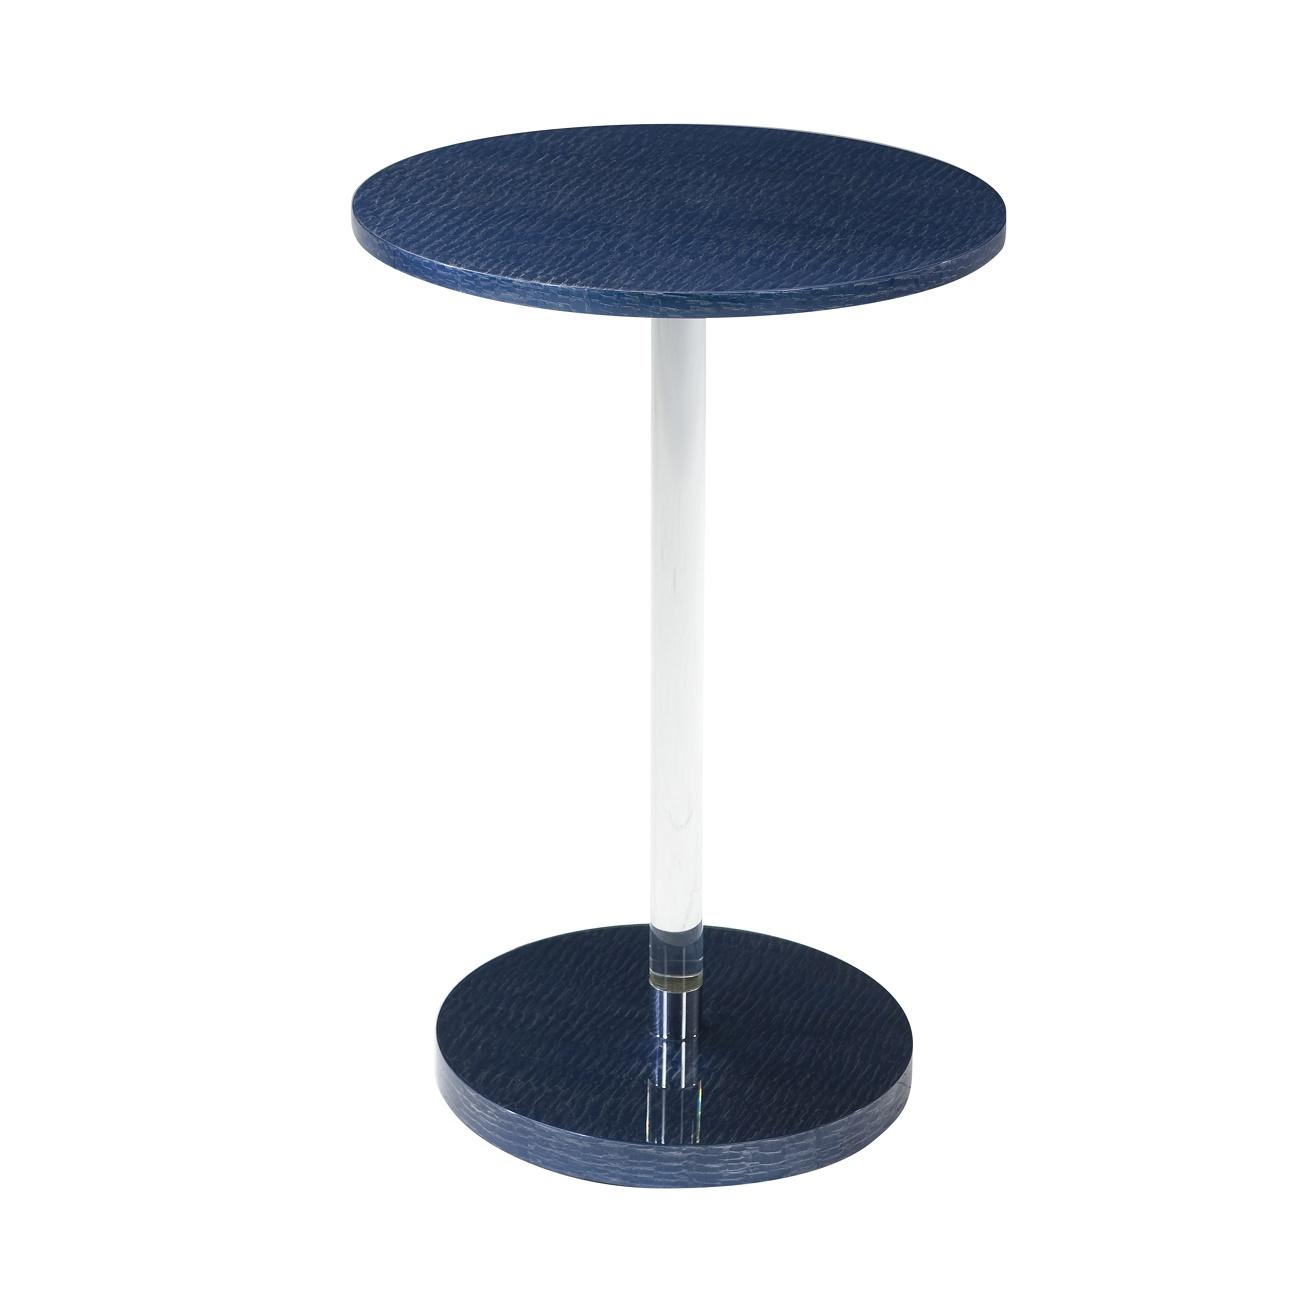 Striate Accent Table 5002 266 theodore alexnder